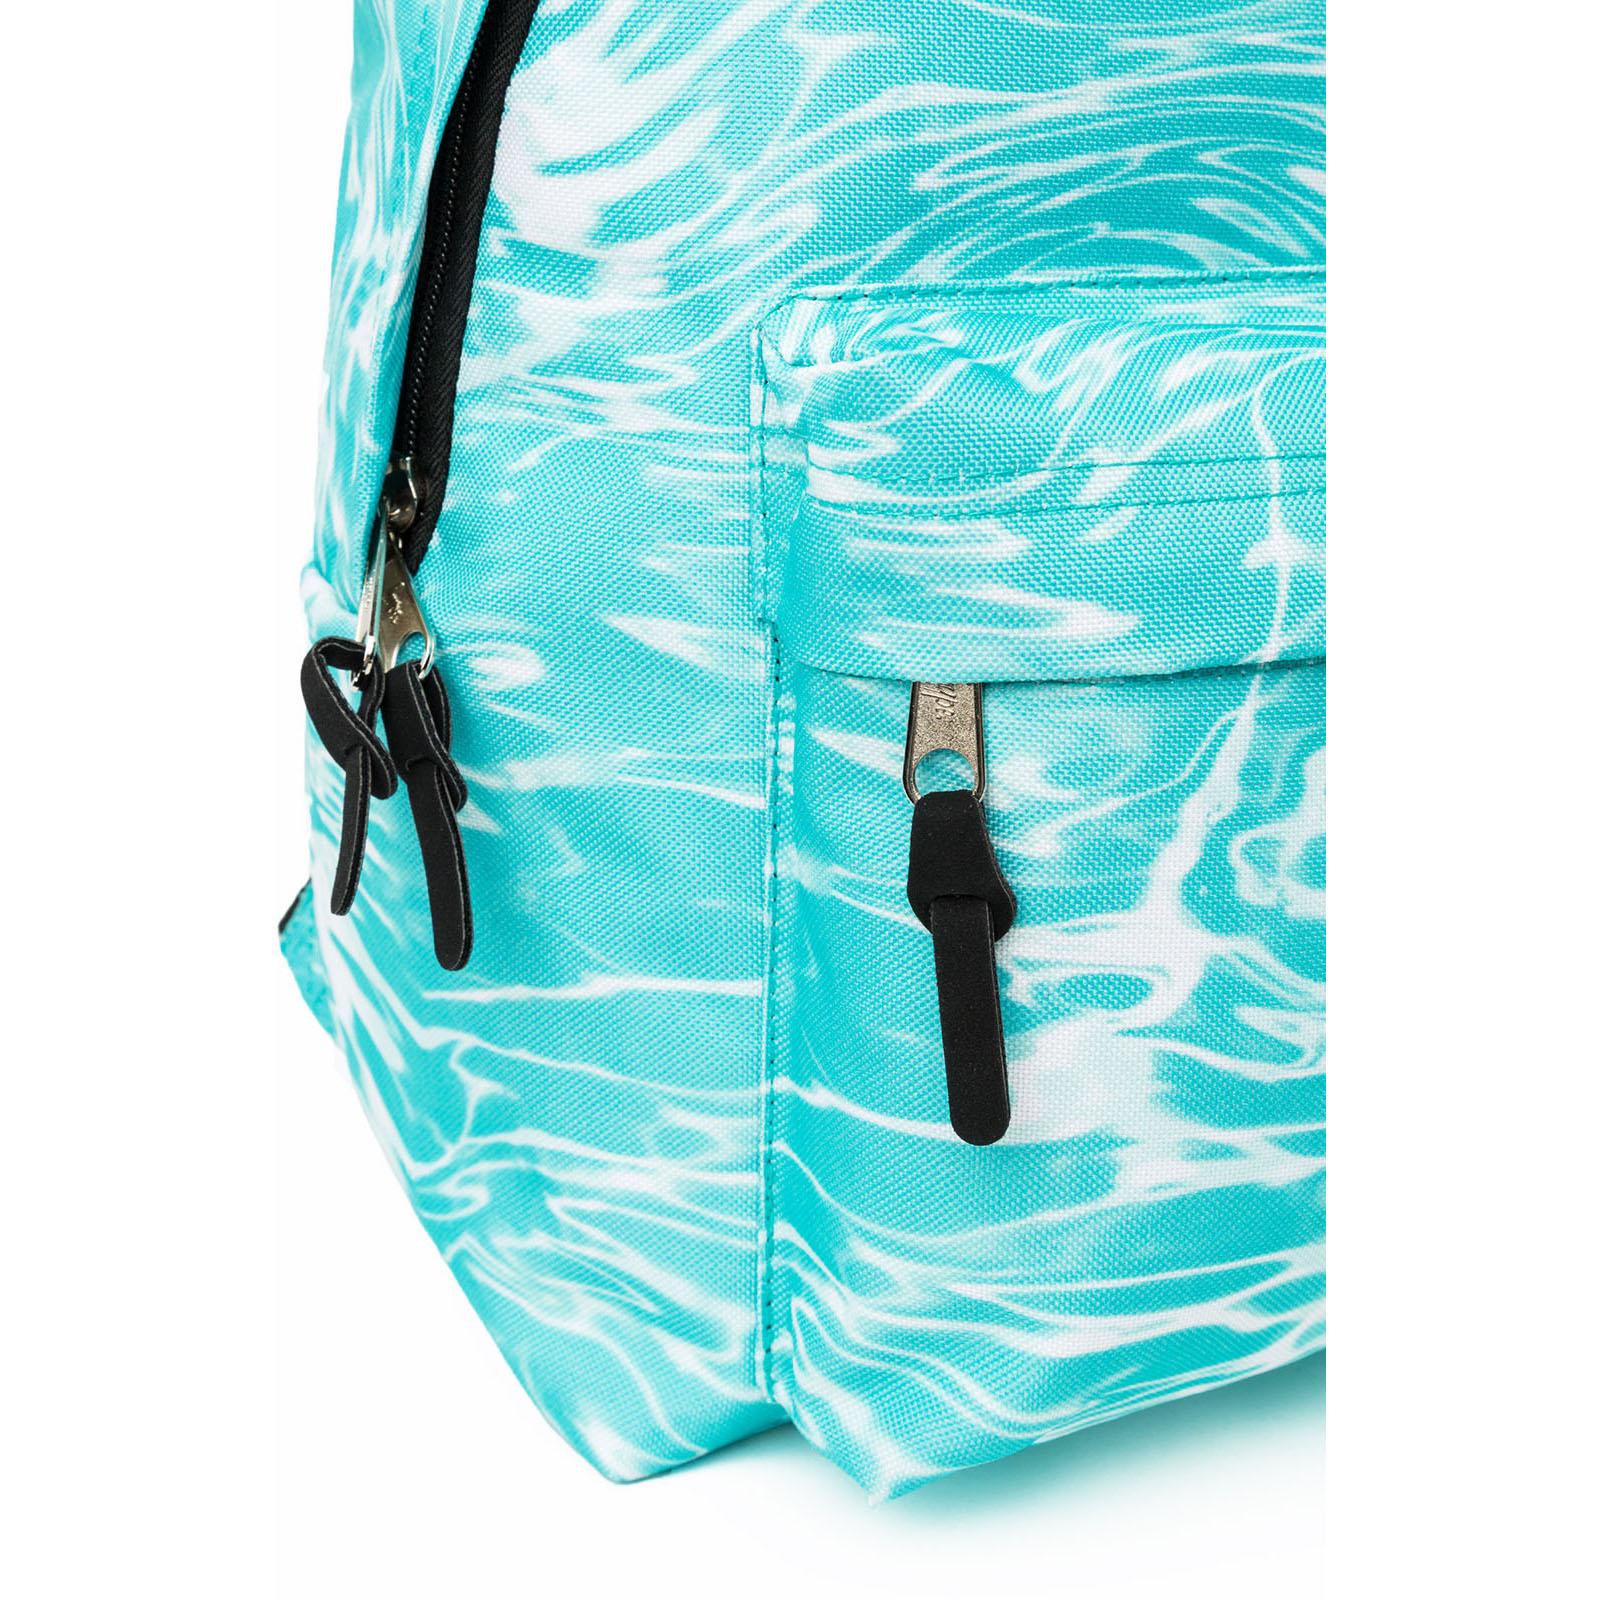 Unisexe-Hype-Sac-A-Dos-Ecole-Gym-SACS-pochettes-pencil-case miniature 21